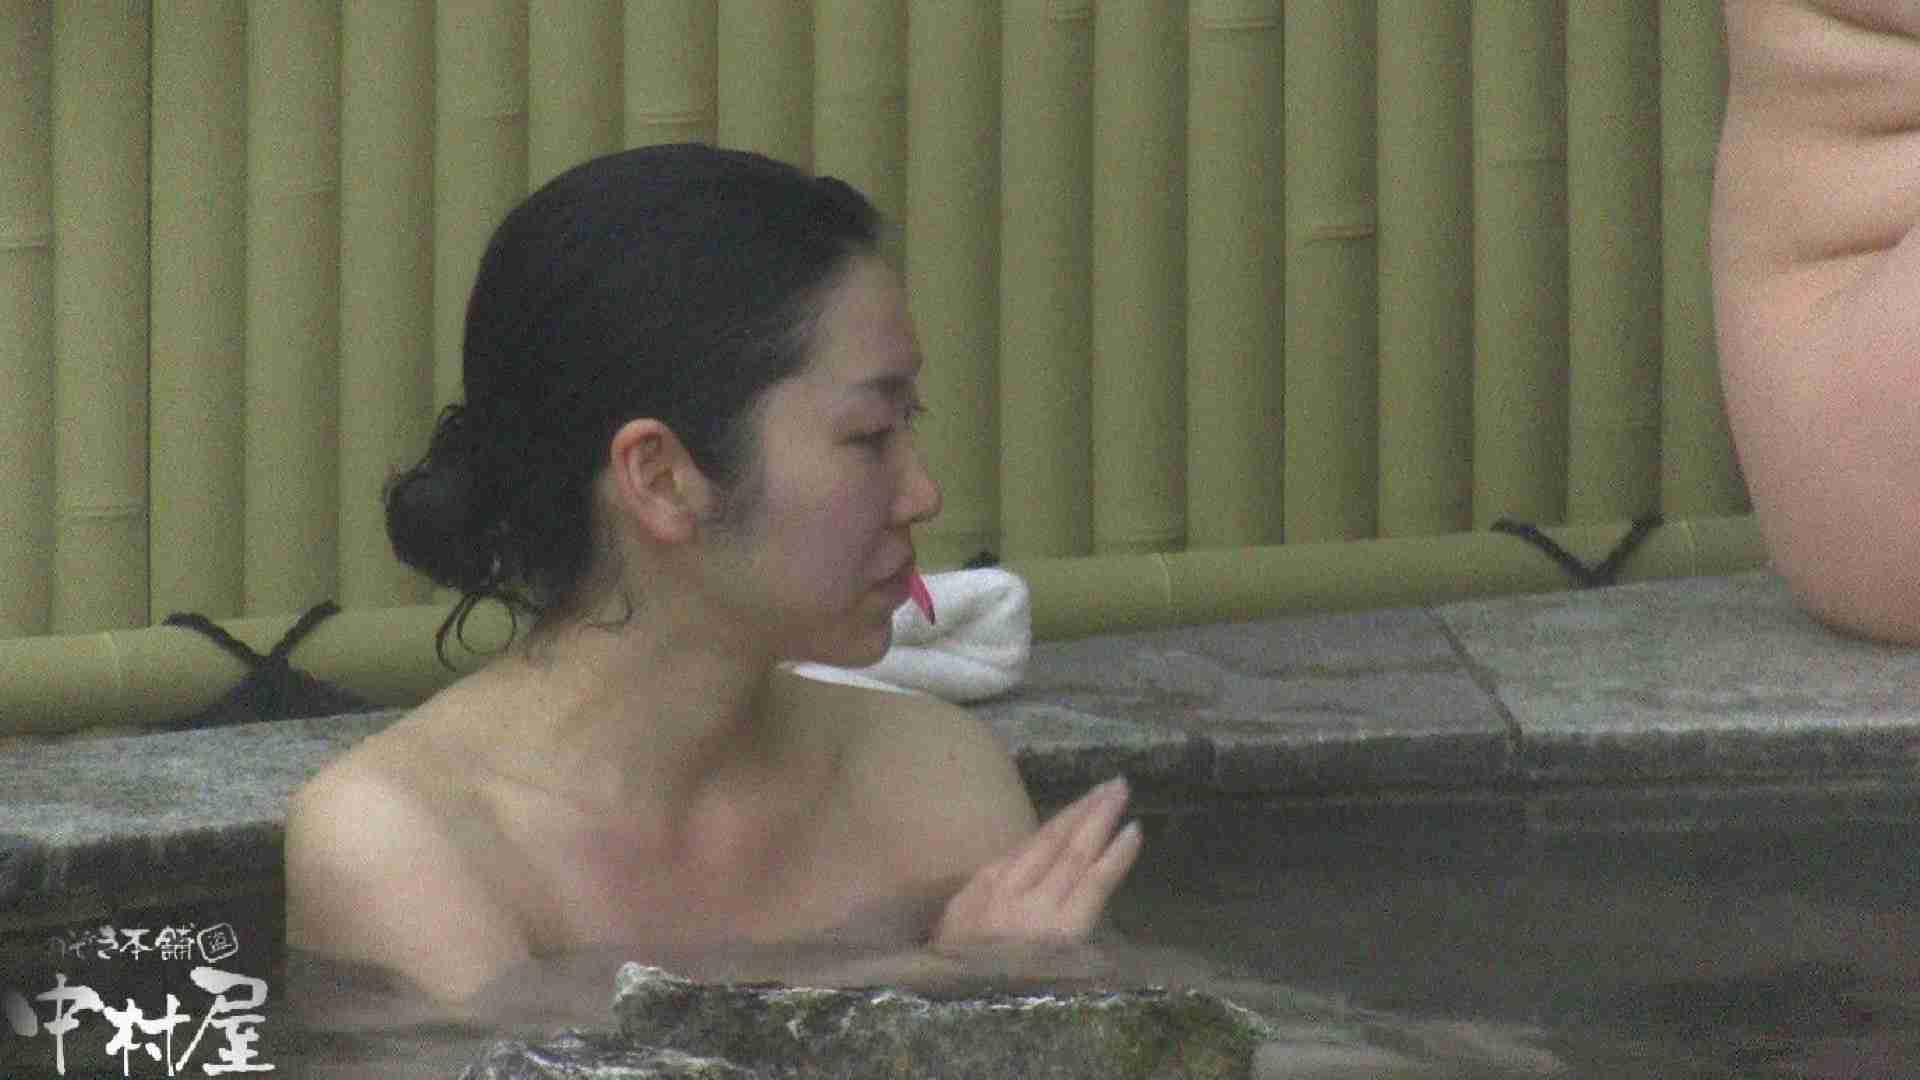 Aquaな露天風呂Vol.917 盗撮シリーズ   露天風呂編  108PIX 57